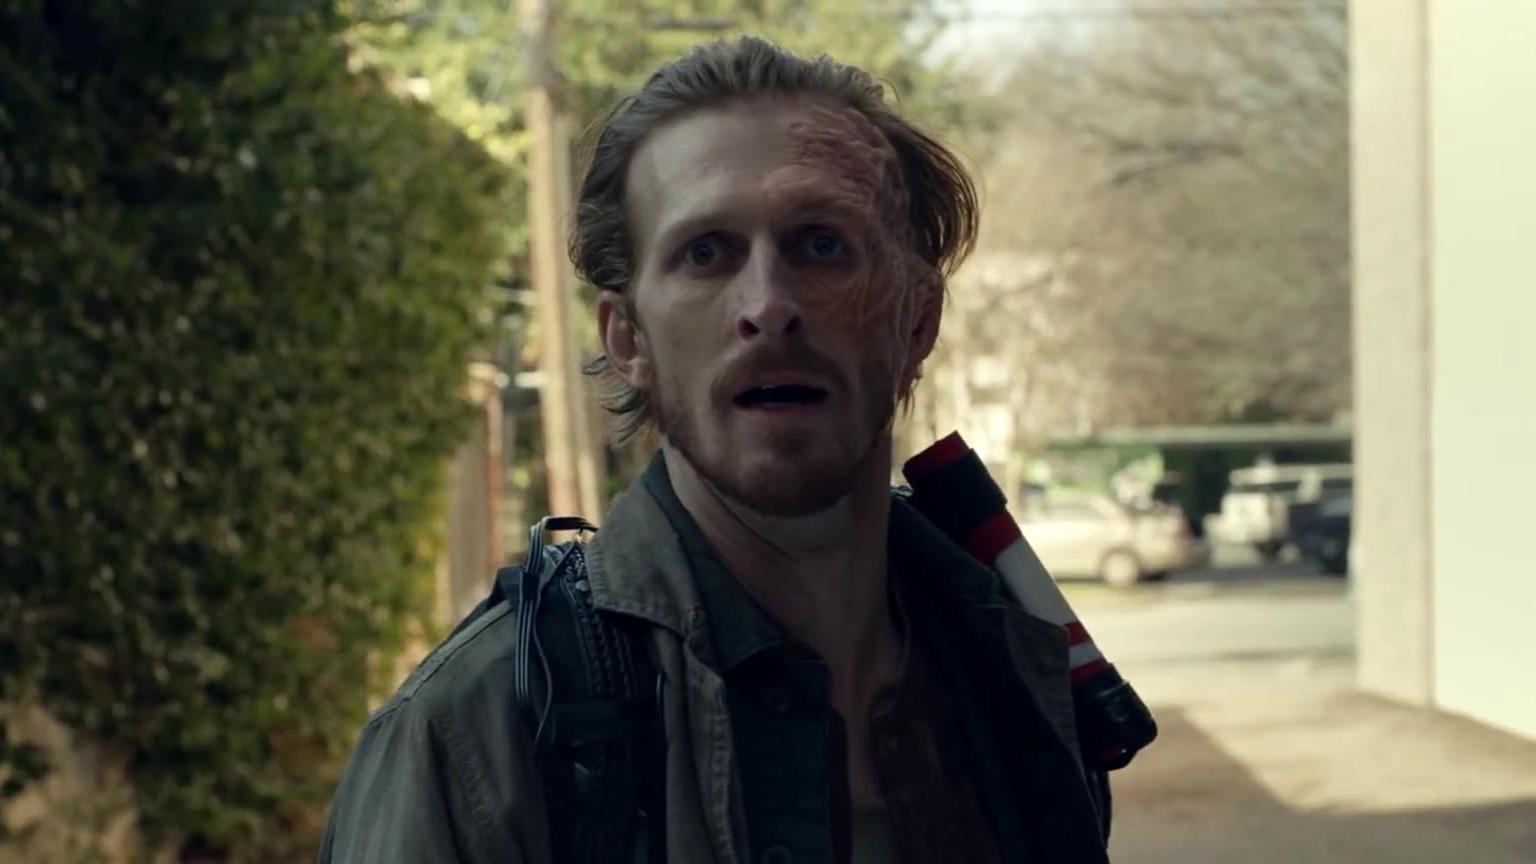 Fear The Walking Dead: Is That You?